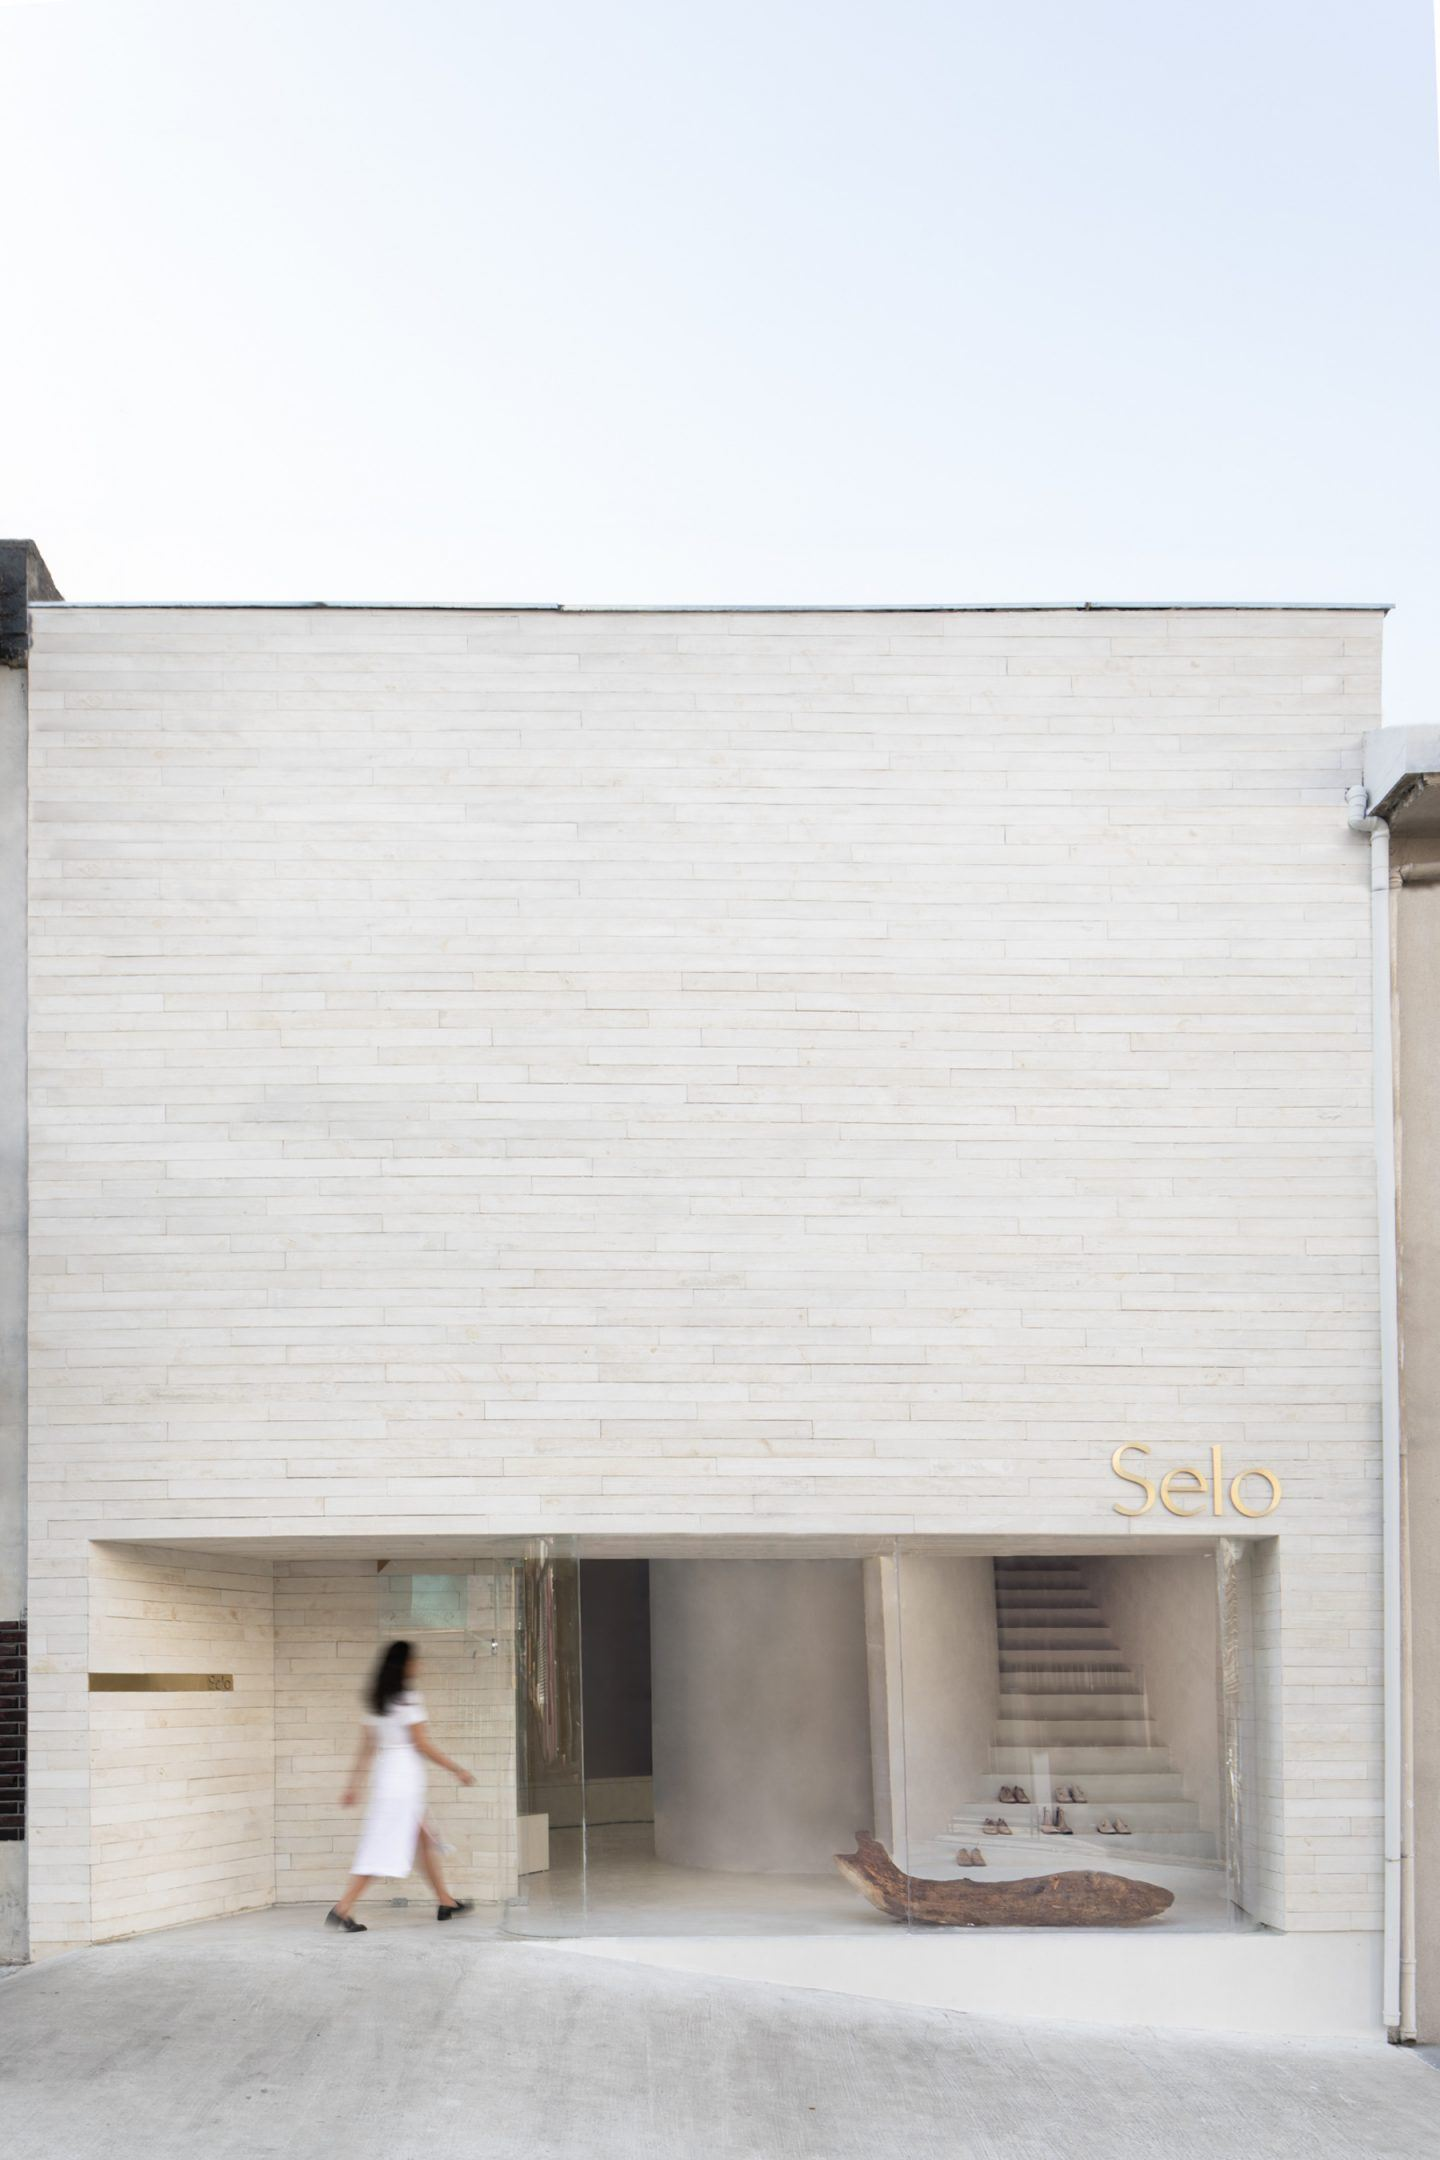 IGNANT-Design-MNMA-Selo-07